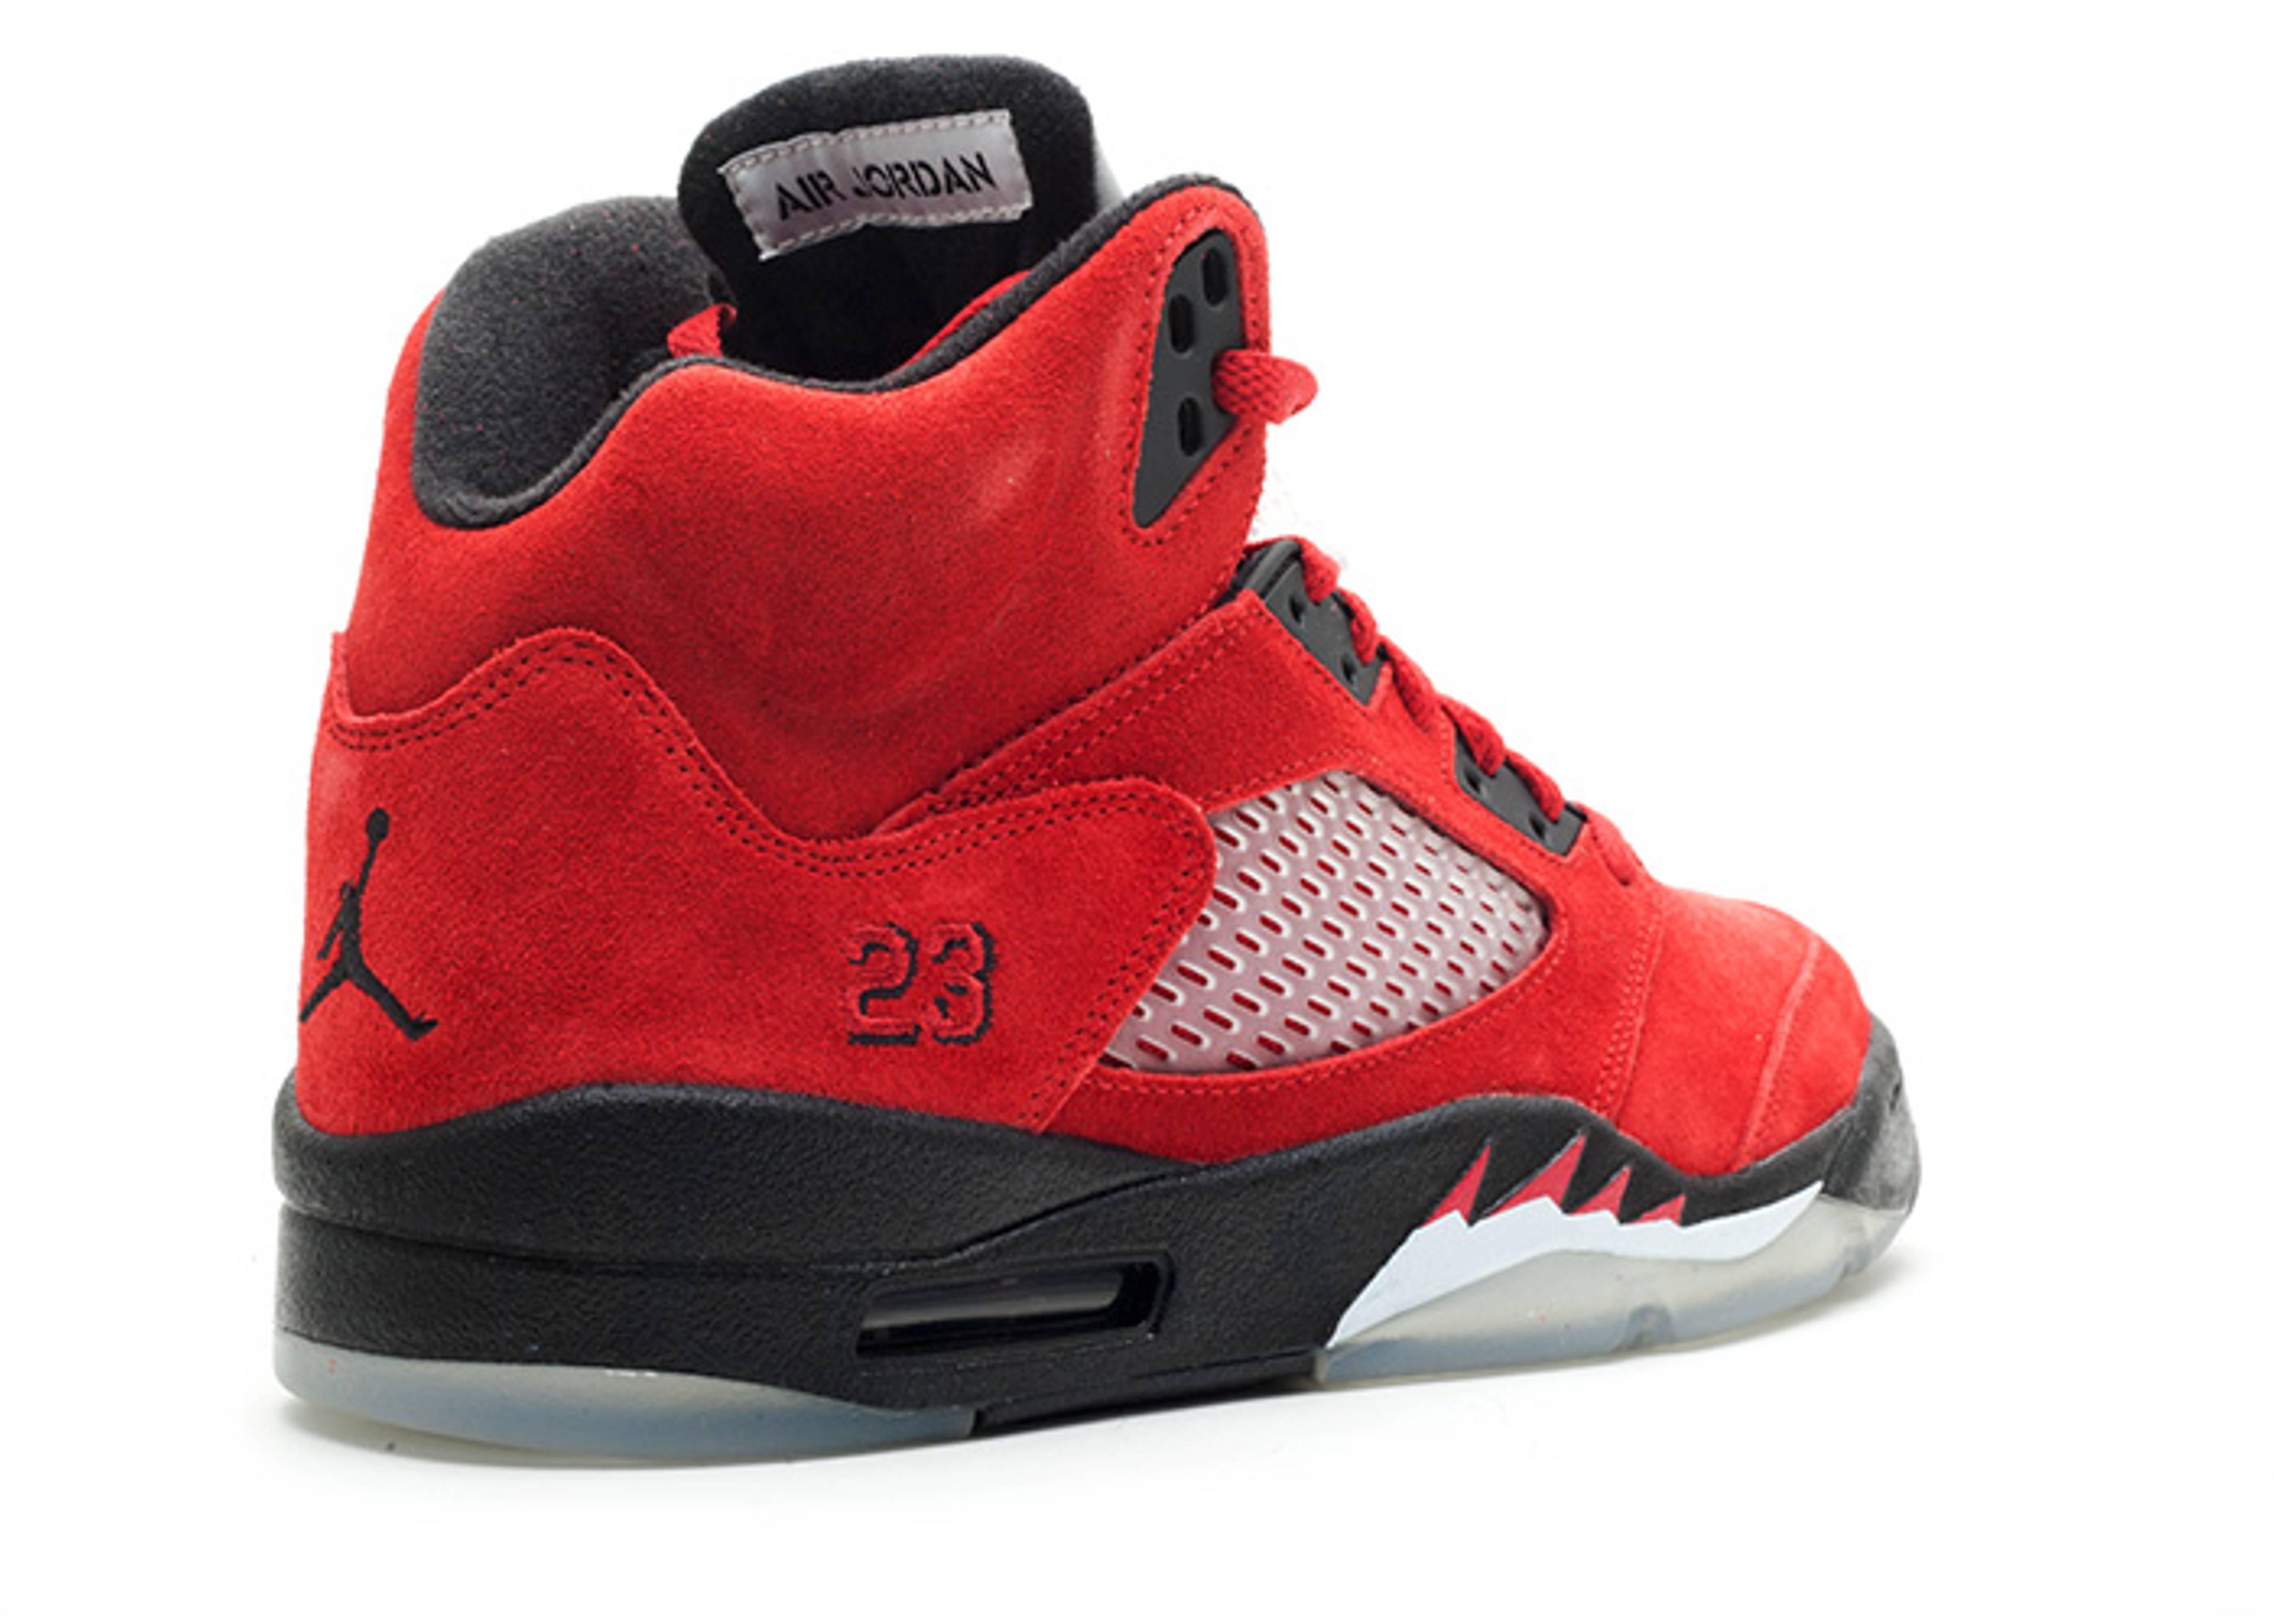 separation shoes 2cf20 05493 ... usa nike jordan 5 retro dmp pack ce92b f3f97